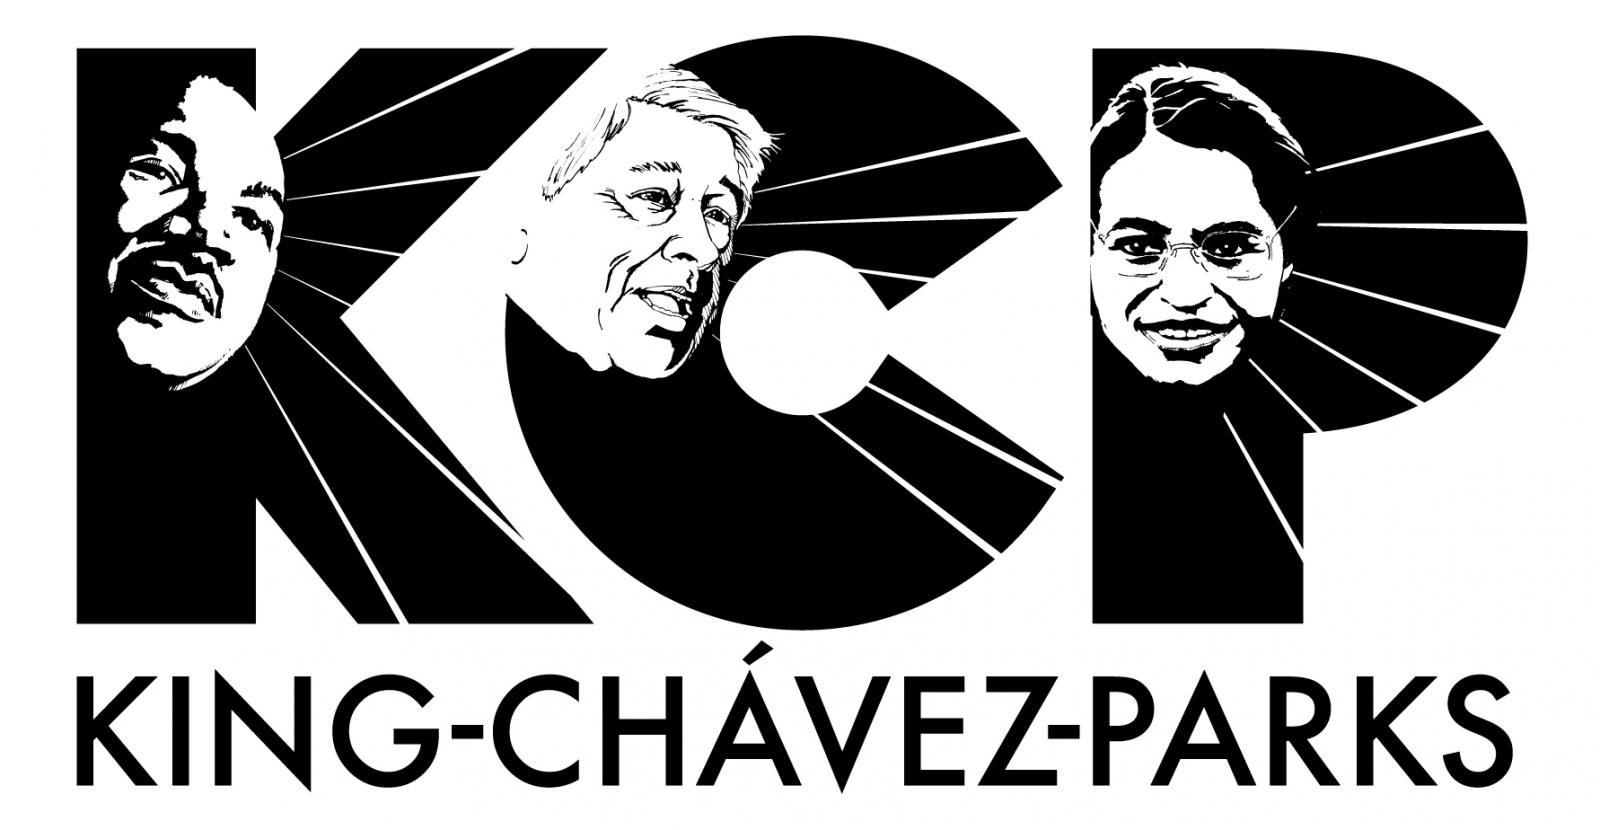 King-Chavez-Parks